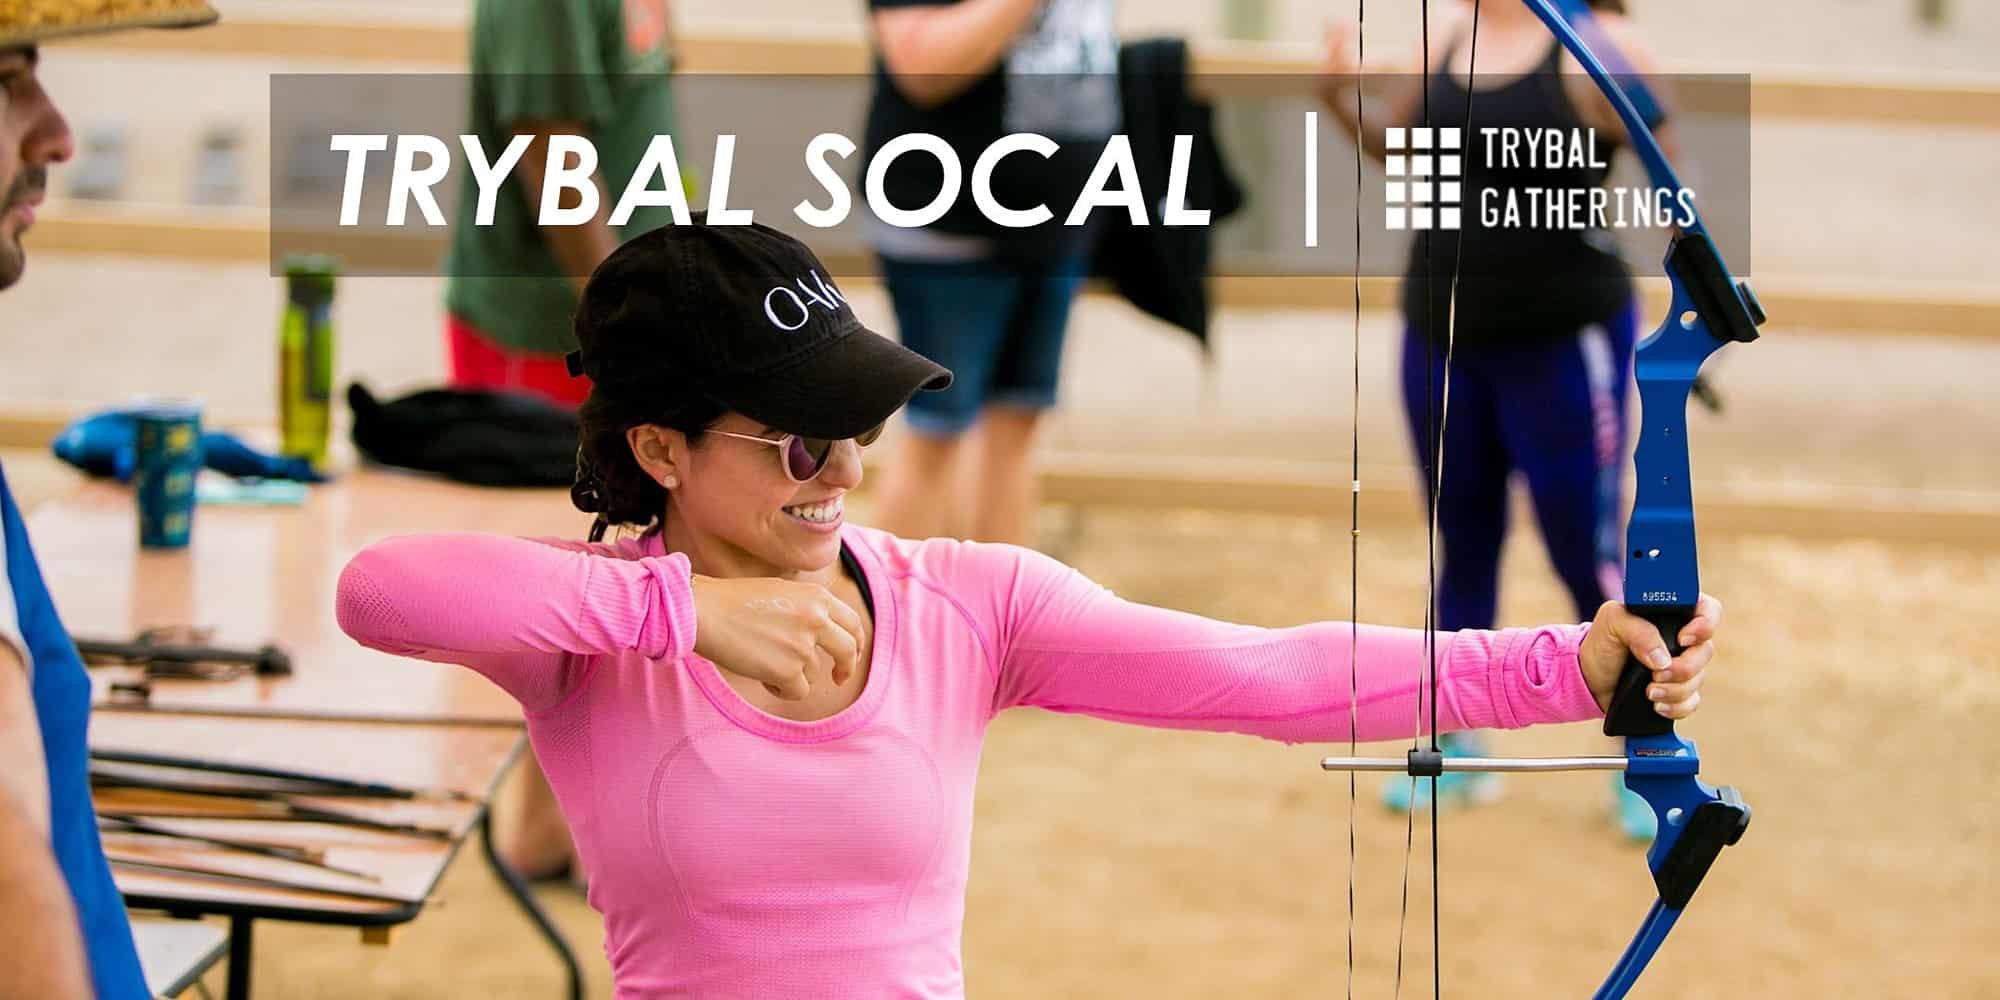 Trybal Gatherings | SoCal 2021